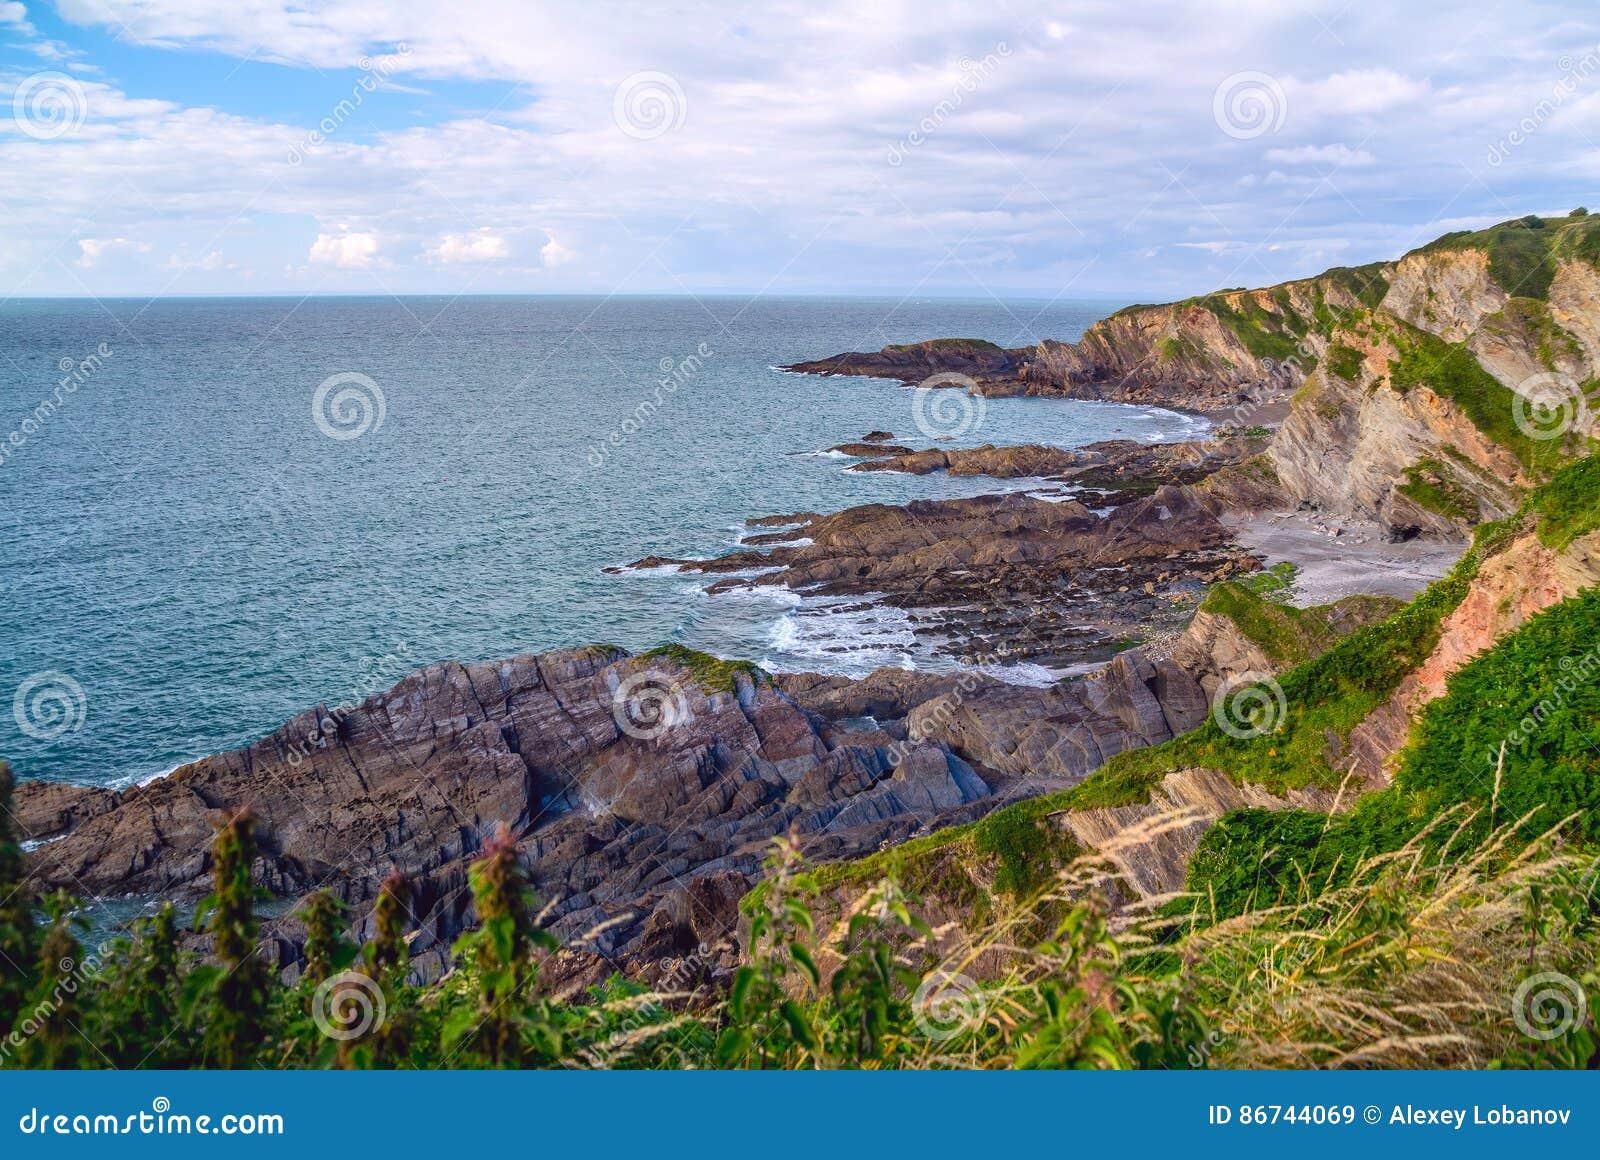 North Devon Coast near Hele Bay